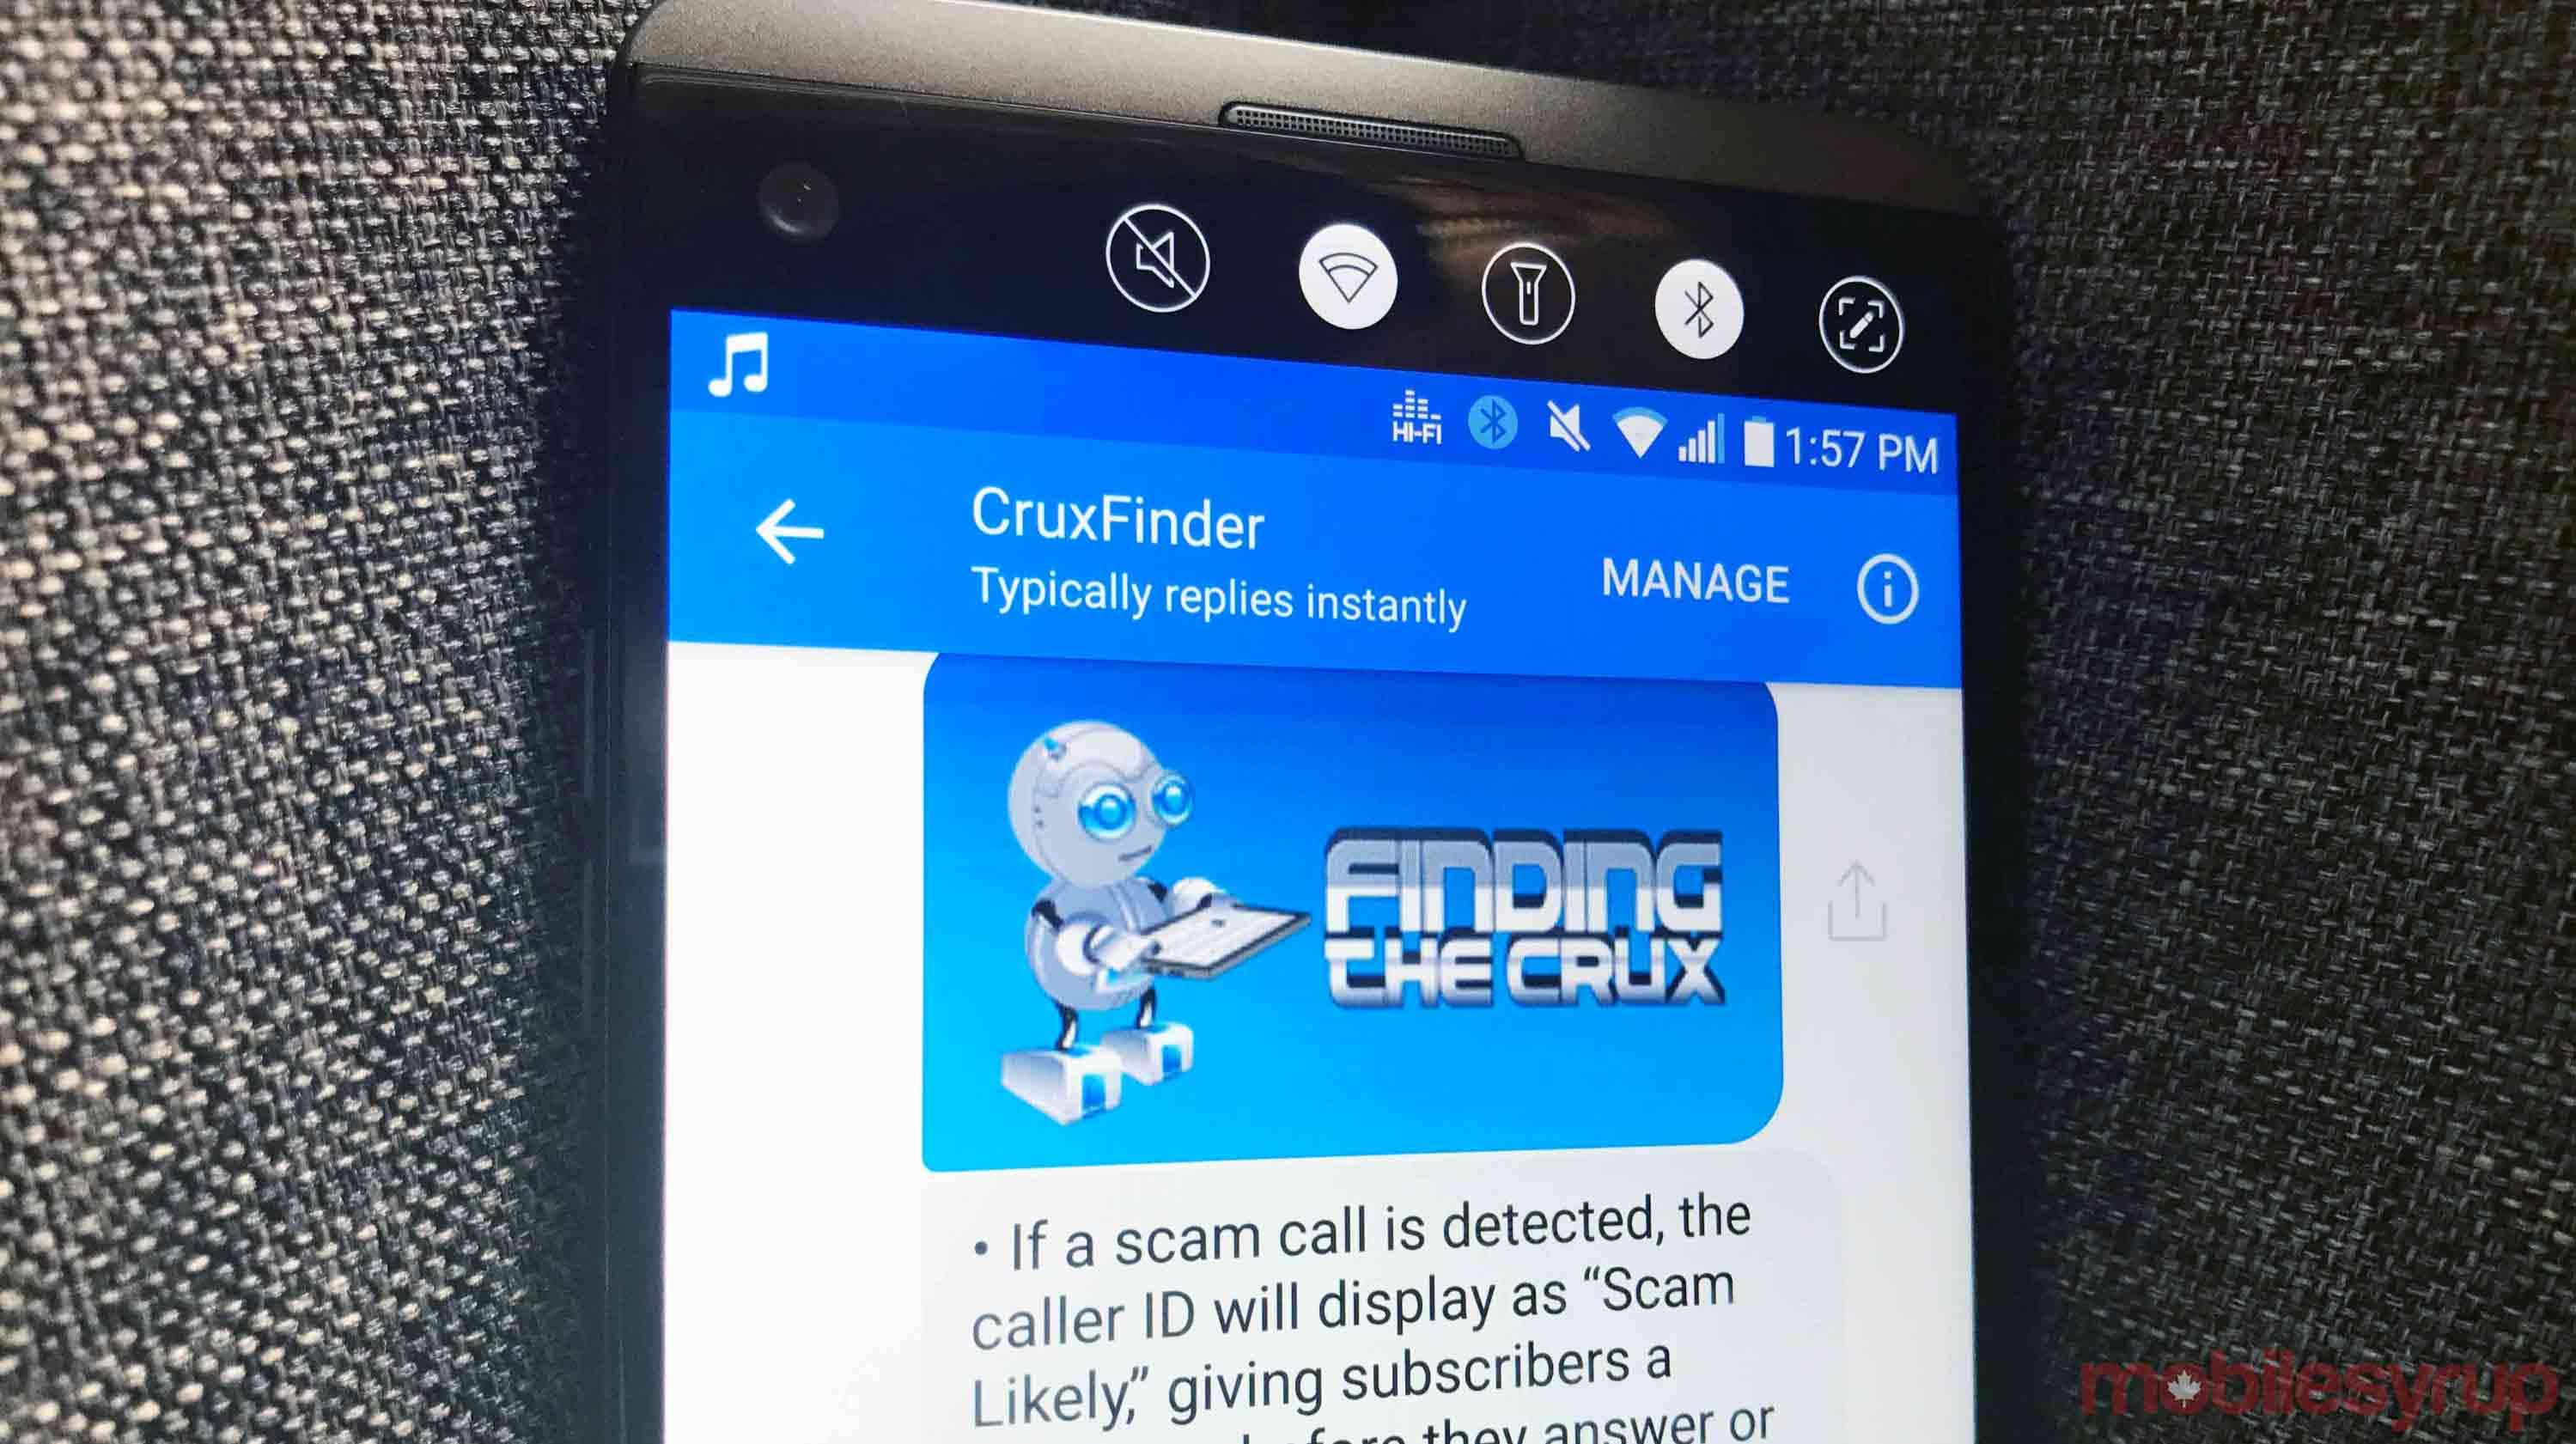 cruxfinder bot screen